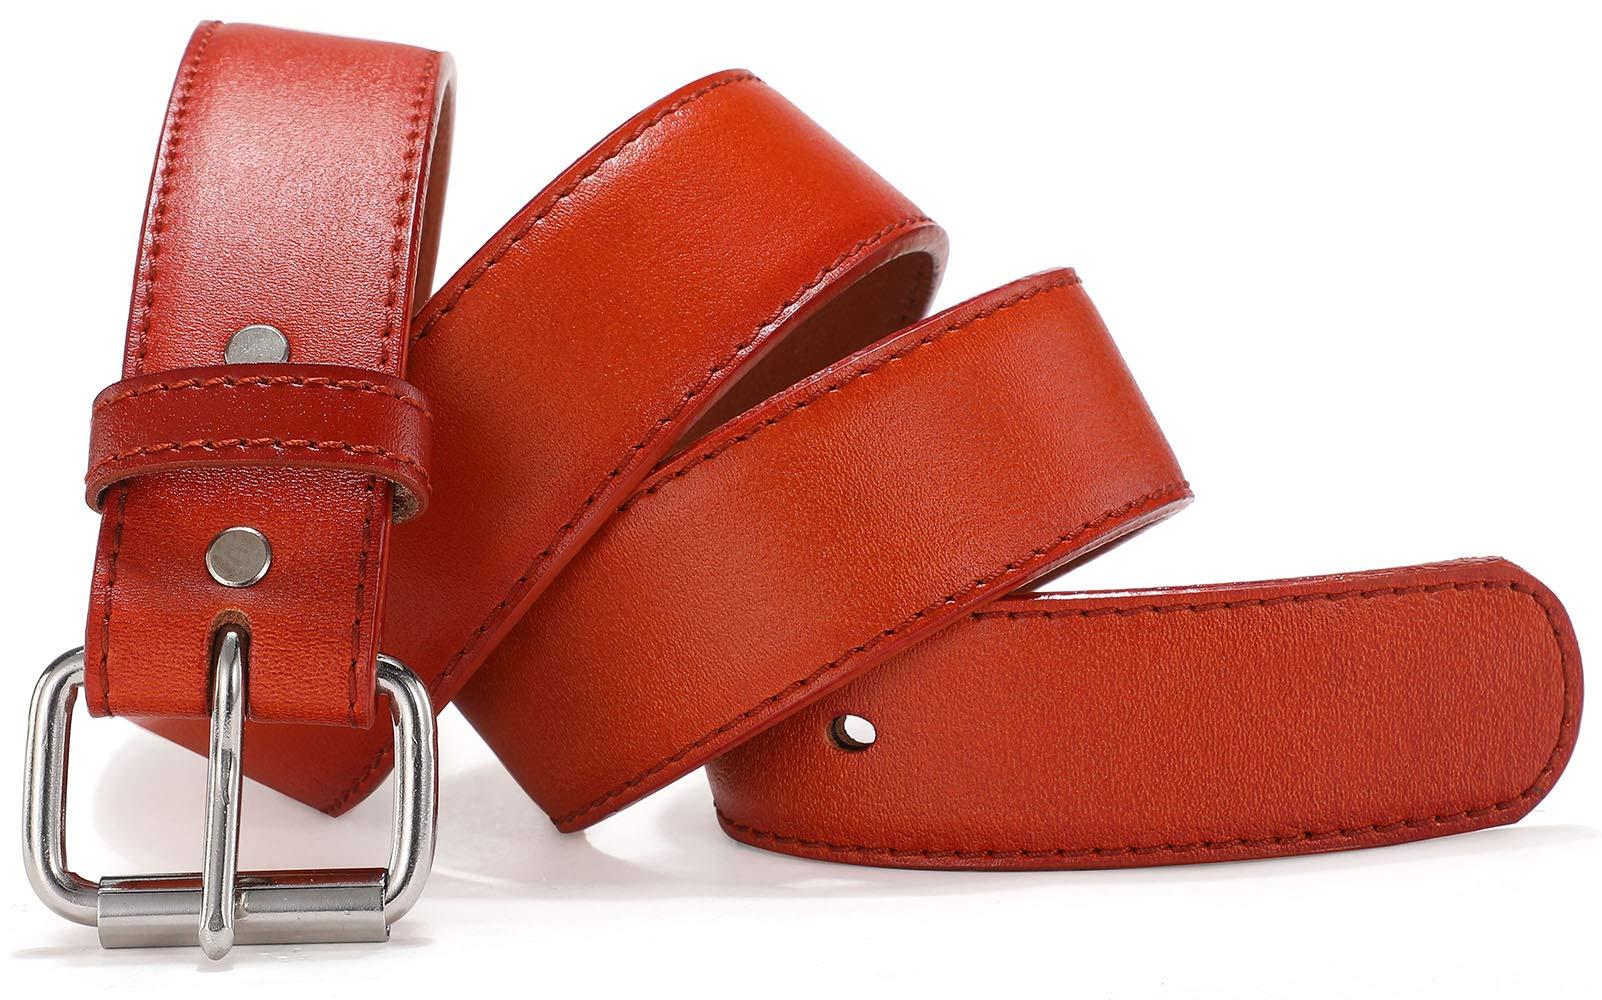 XGeek Concealed Carry CCW Leather Gun Belt | Genuine Leather Belt for Gun Carry | Mens Heavy Duty EDC Belt 1 1/2-Inch